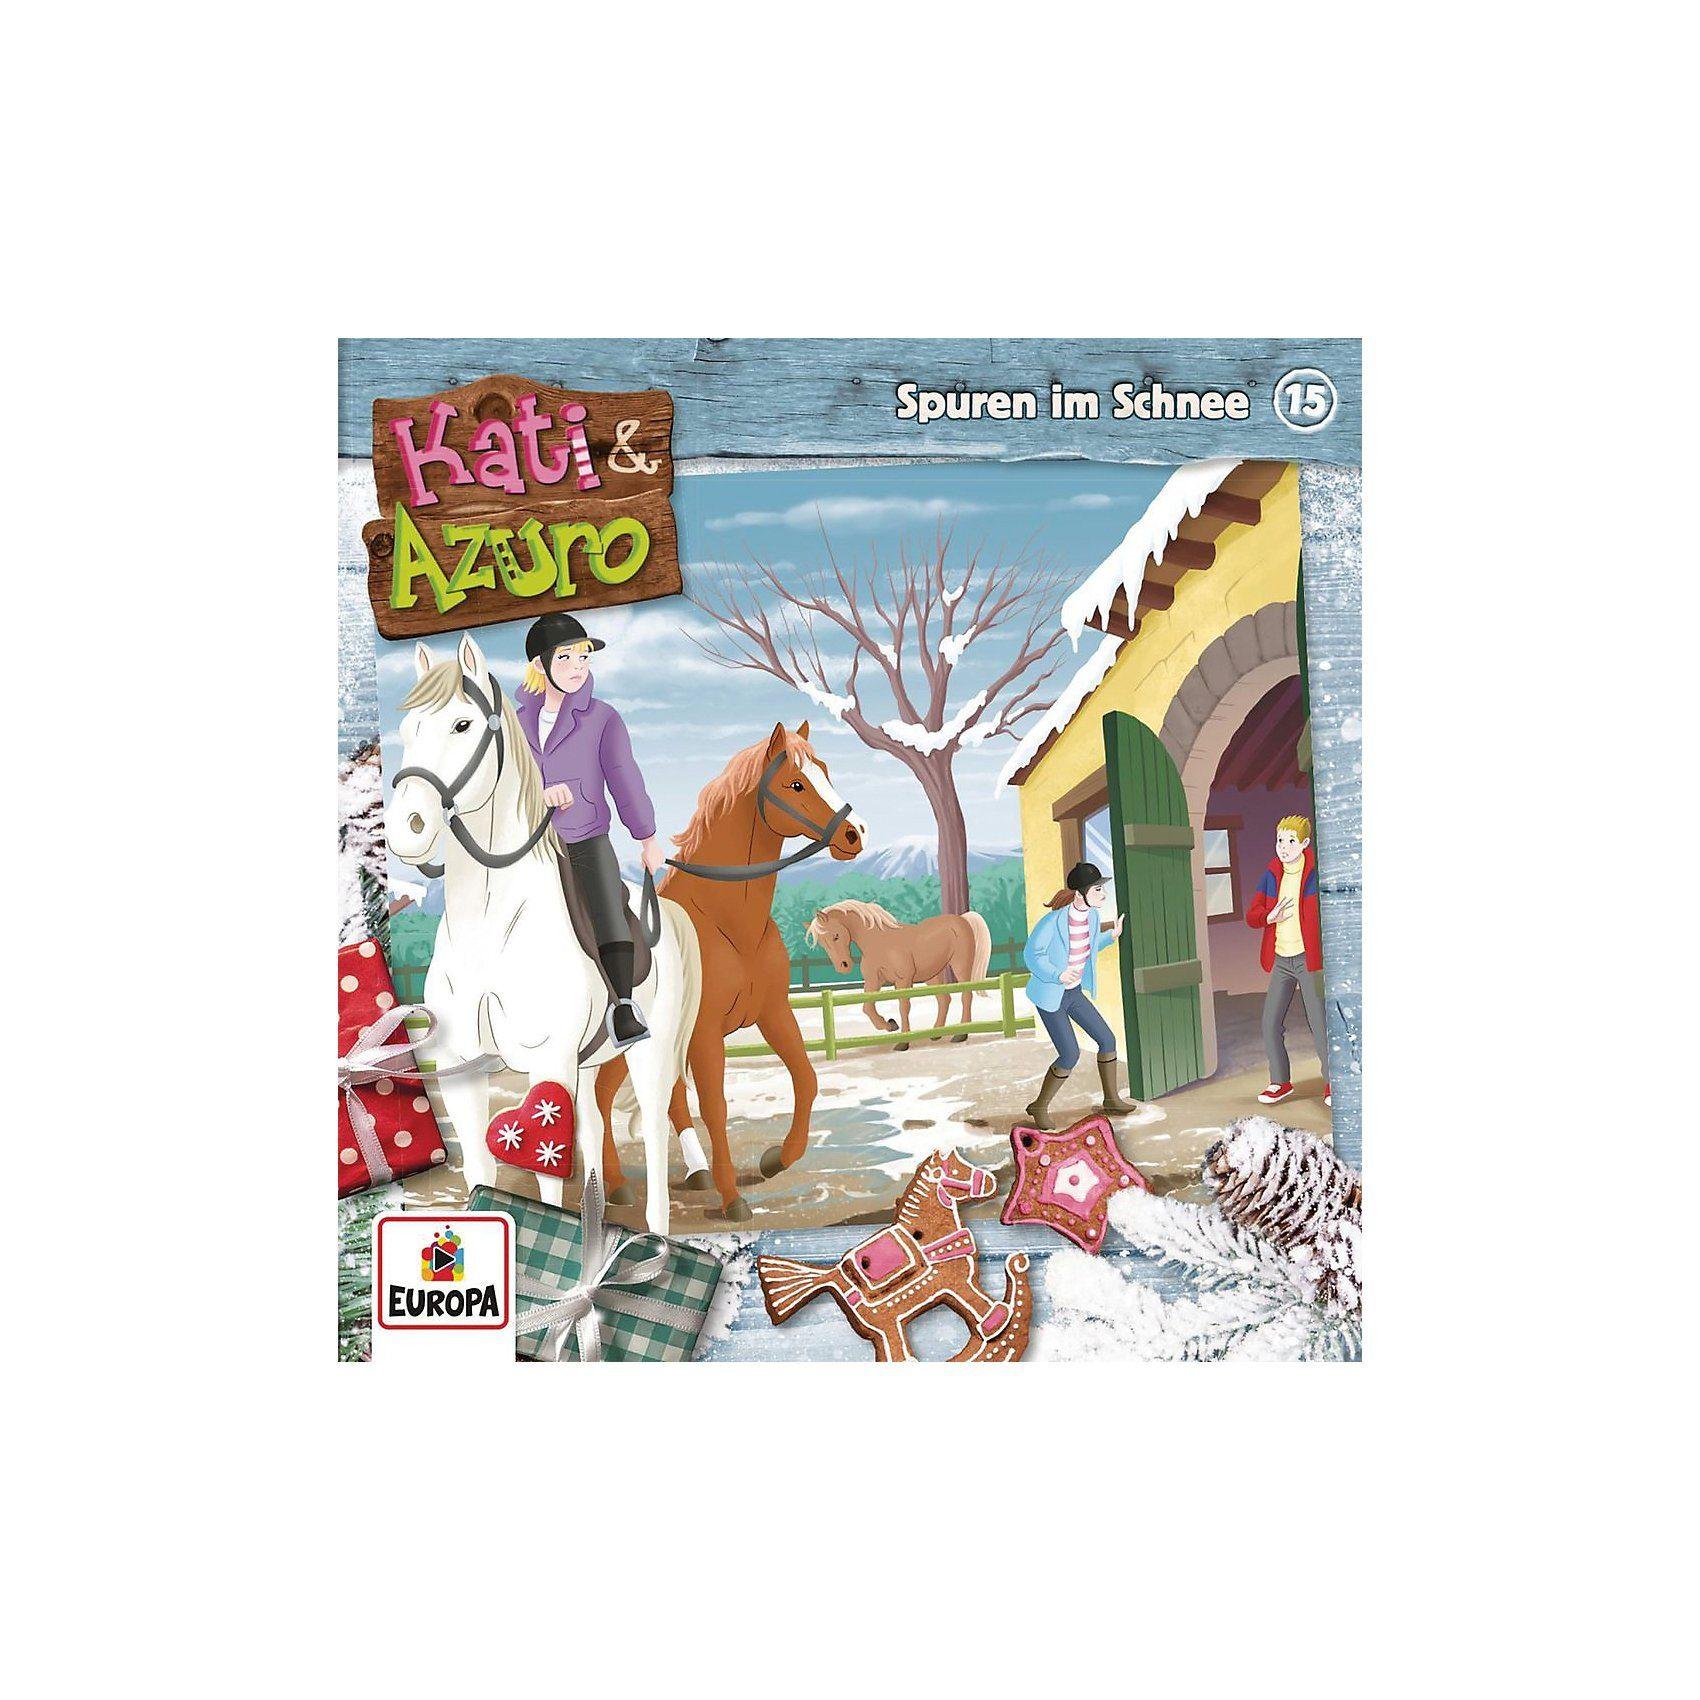 Sony CD Kati & Azuro 15 - Spuren im Schnee